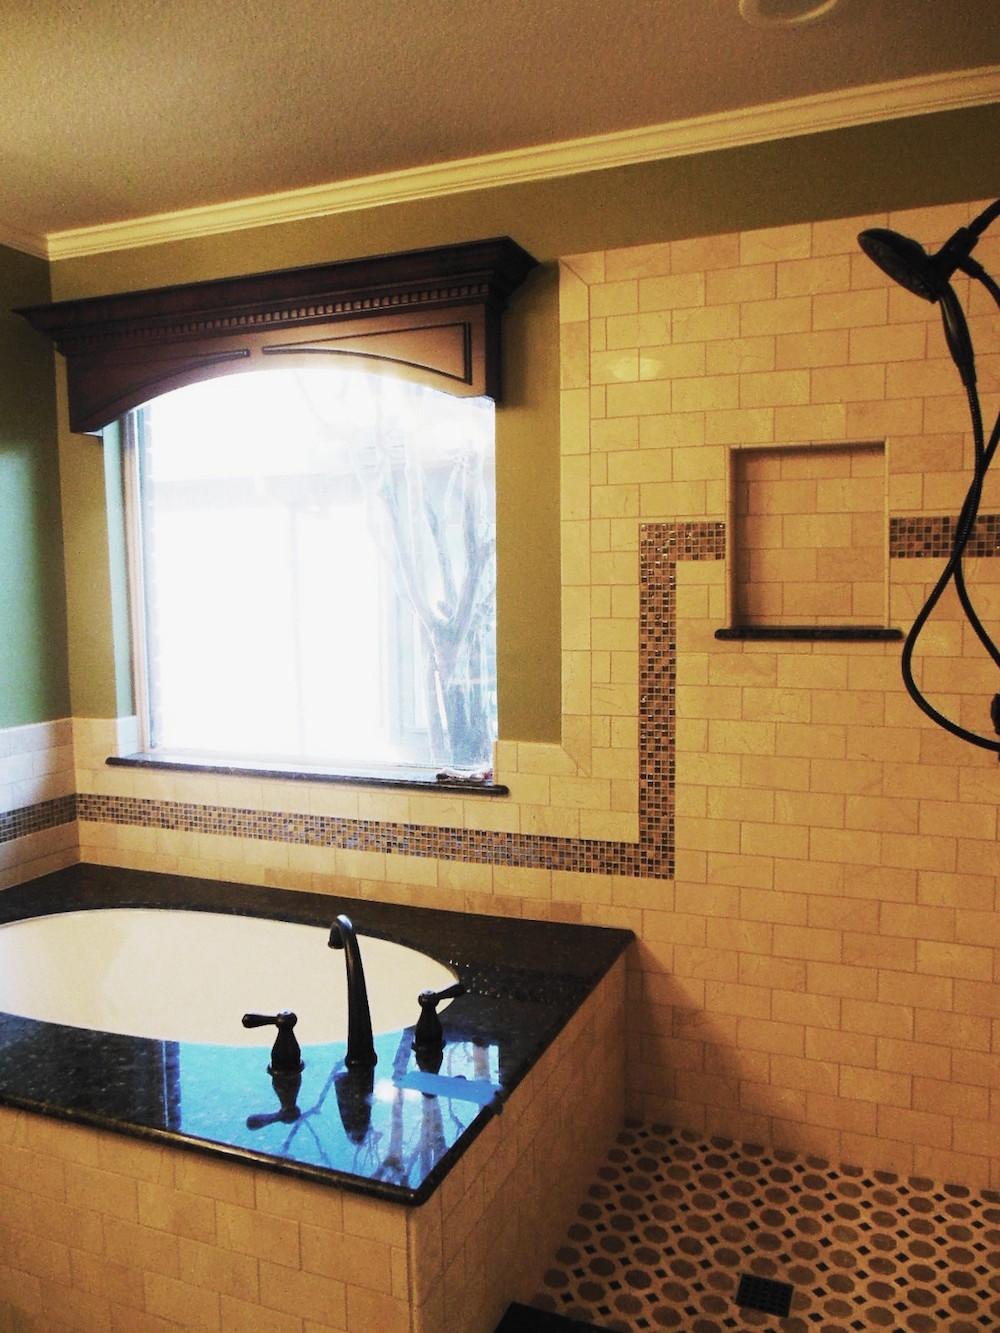 Bathroom Agape Home Services - Bathroom remodel carrollton tx